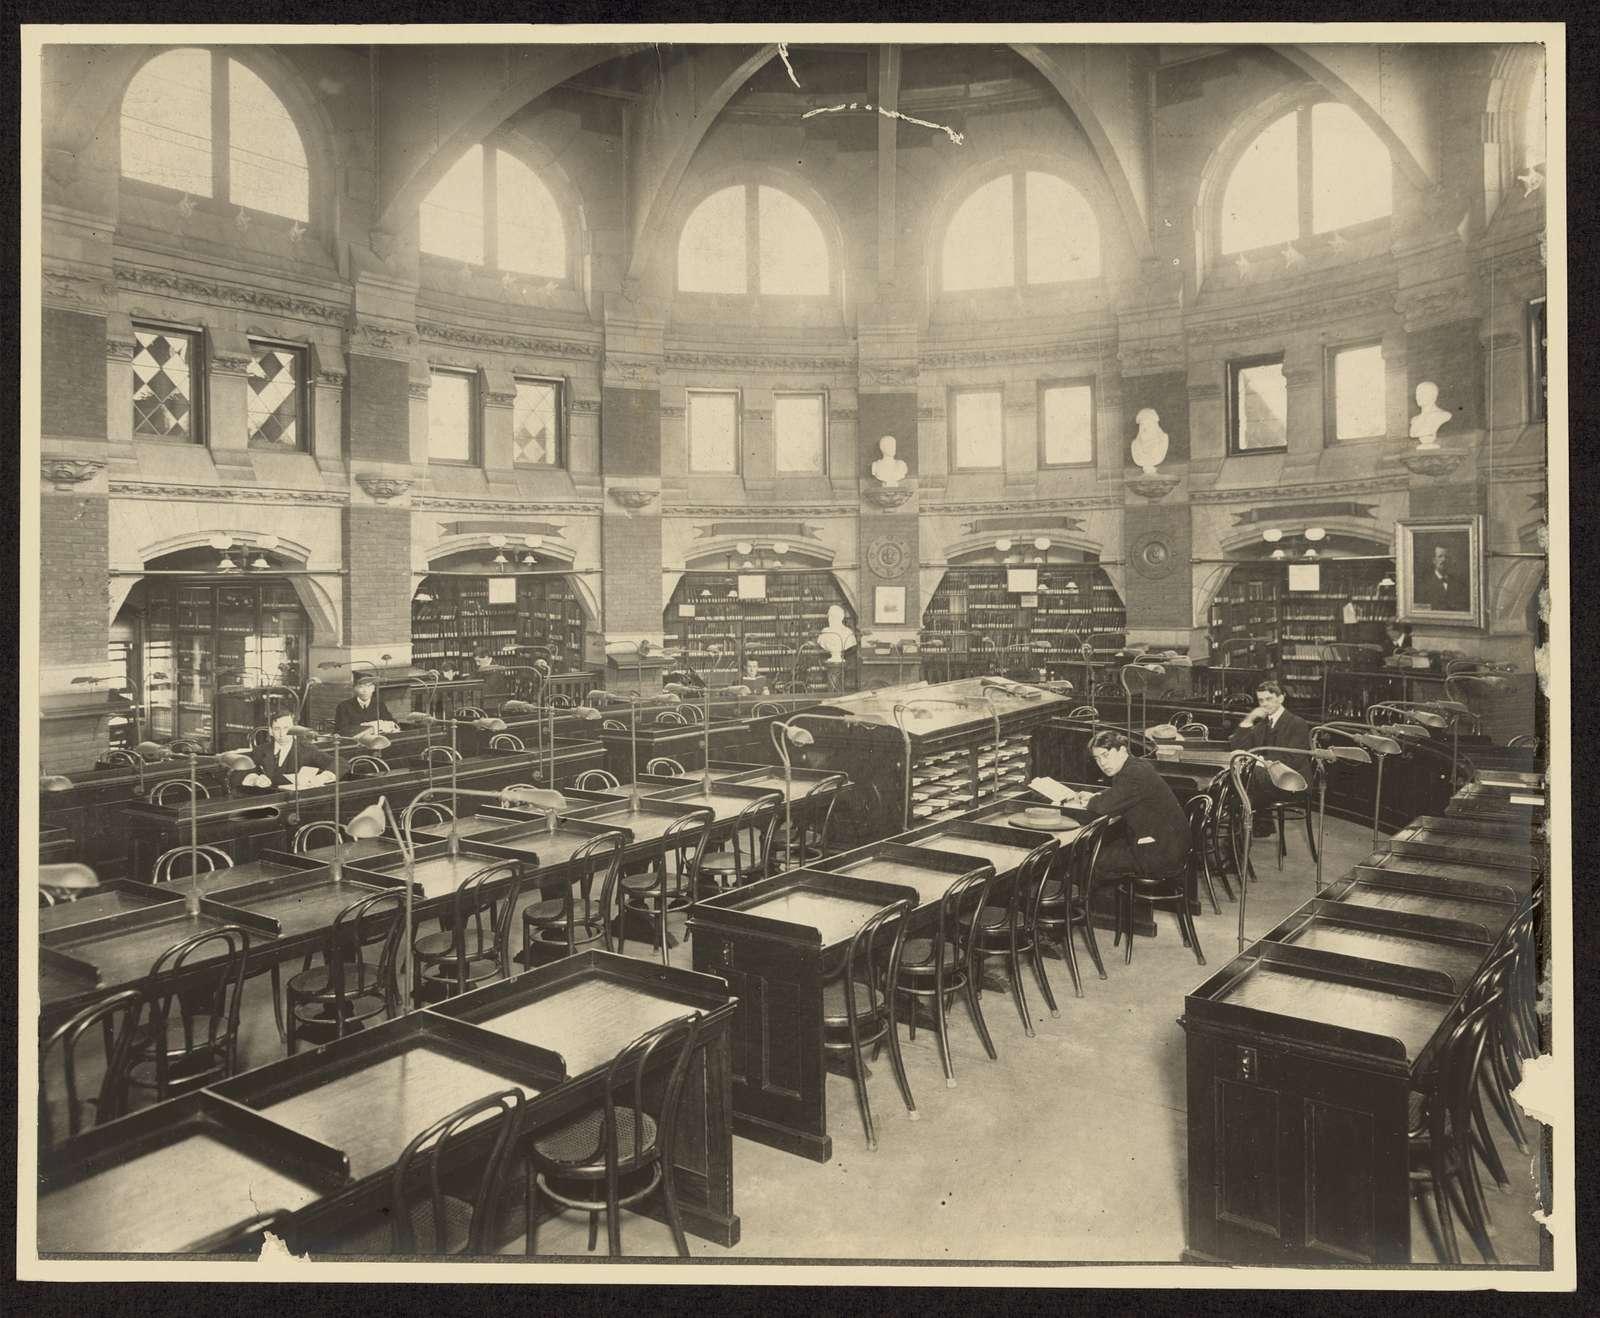 [Reading room, University of Pennsylvania Library, Philadelphia, Pennsylvania]